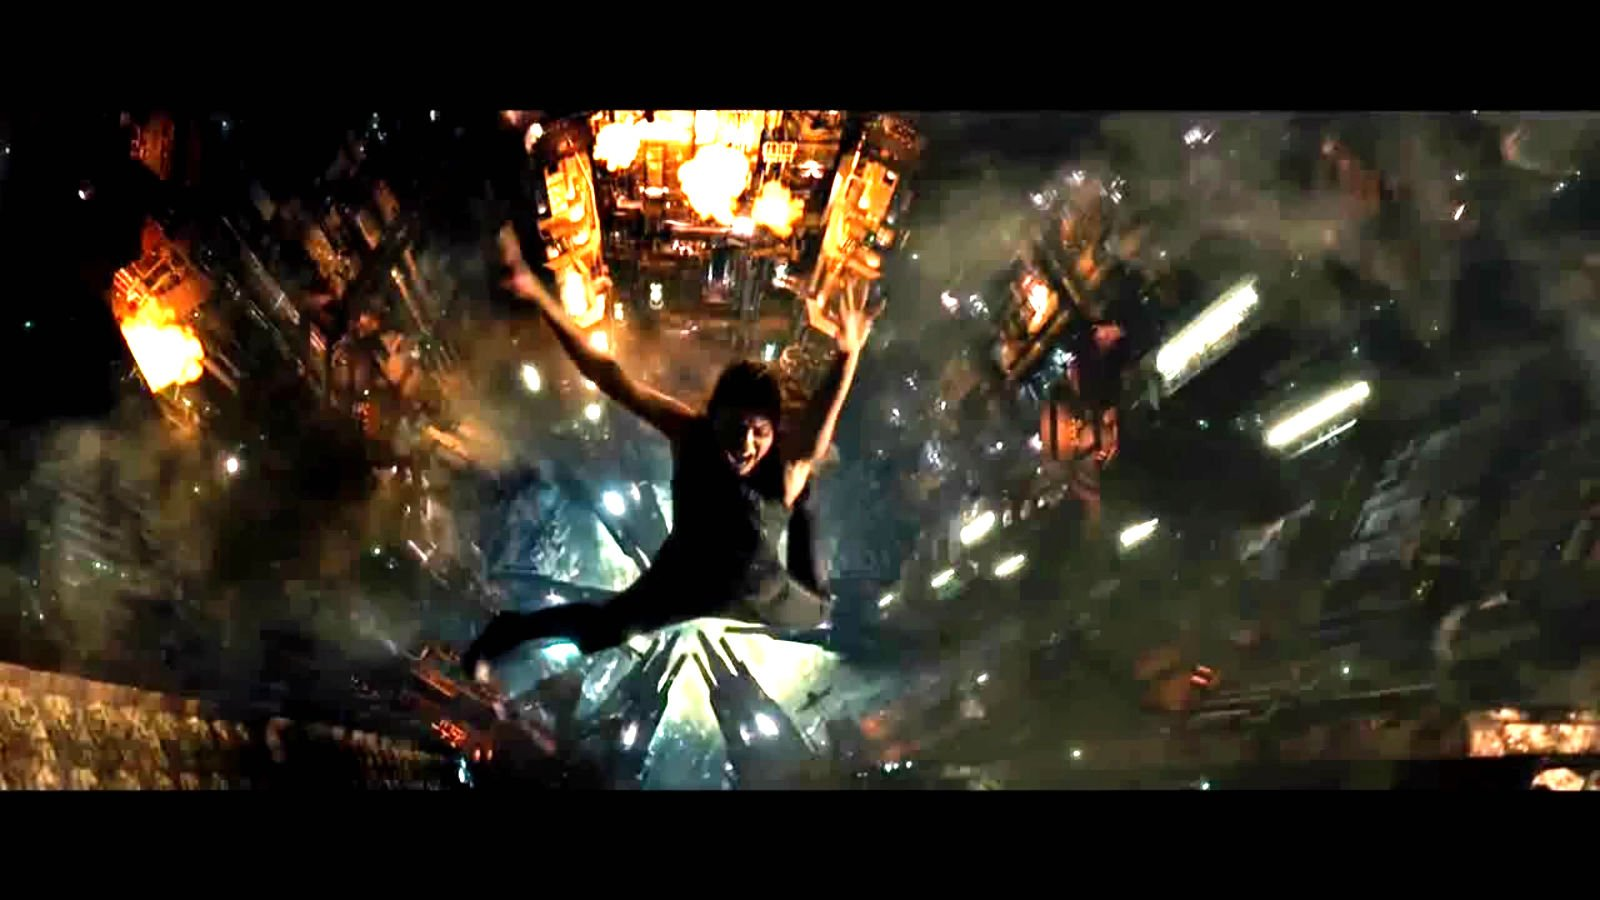 Jupiter Ascending Retina Movie Wallpaper: JUPITER ASCENDING Action Adventure Sci-fi Movie Film (23